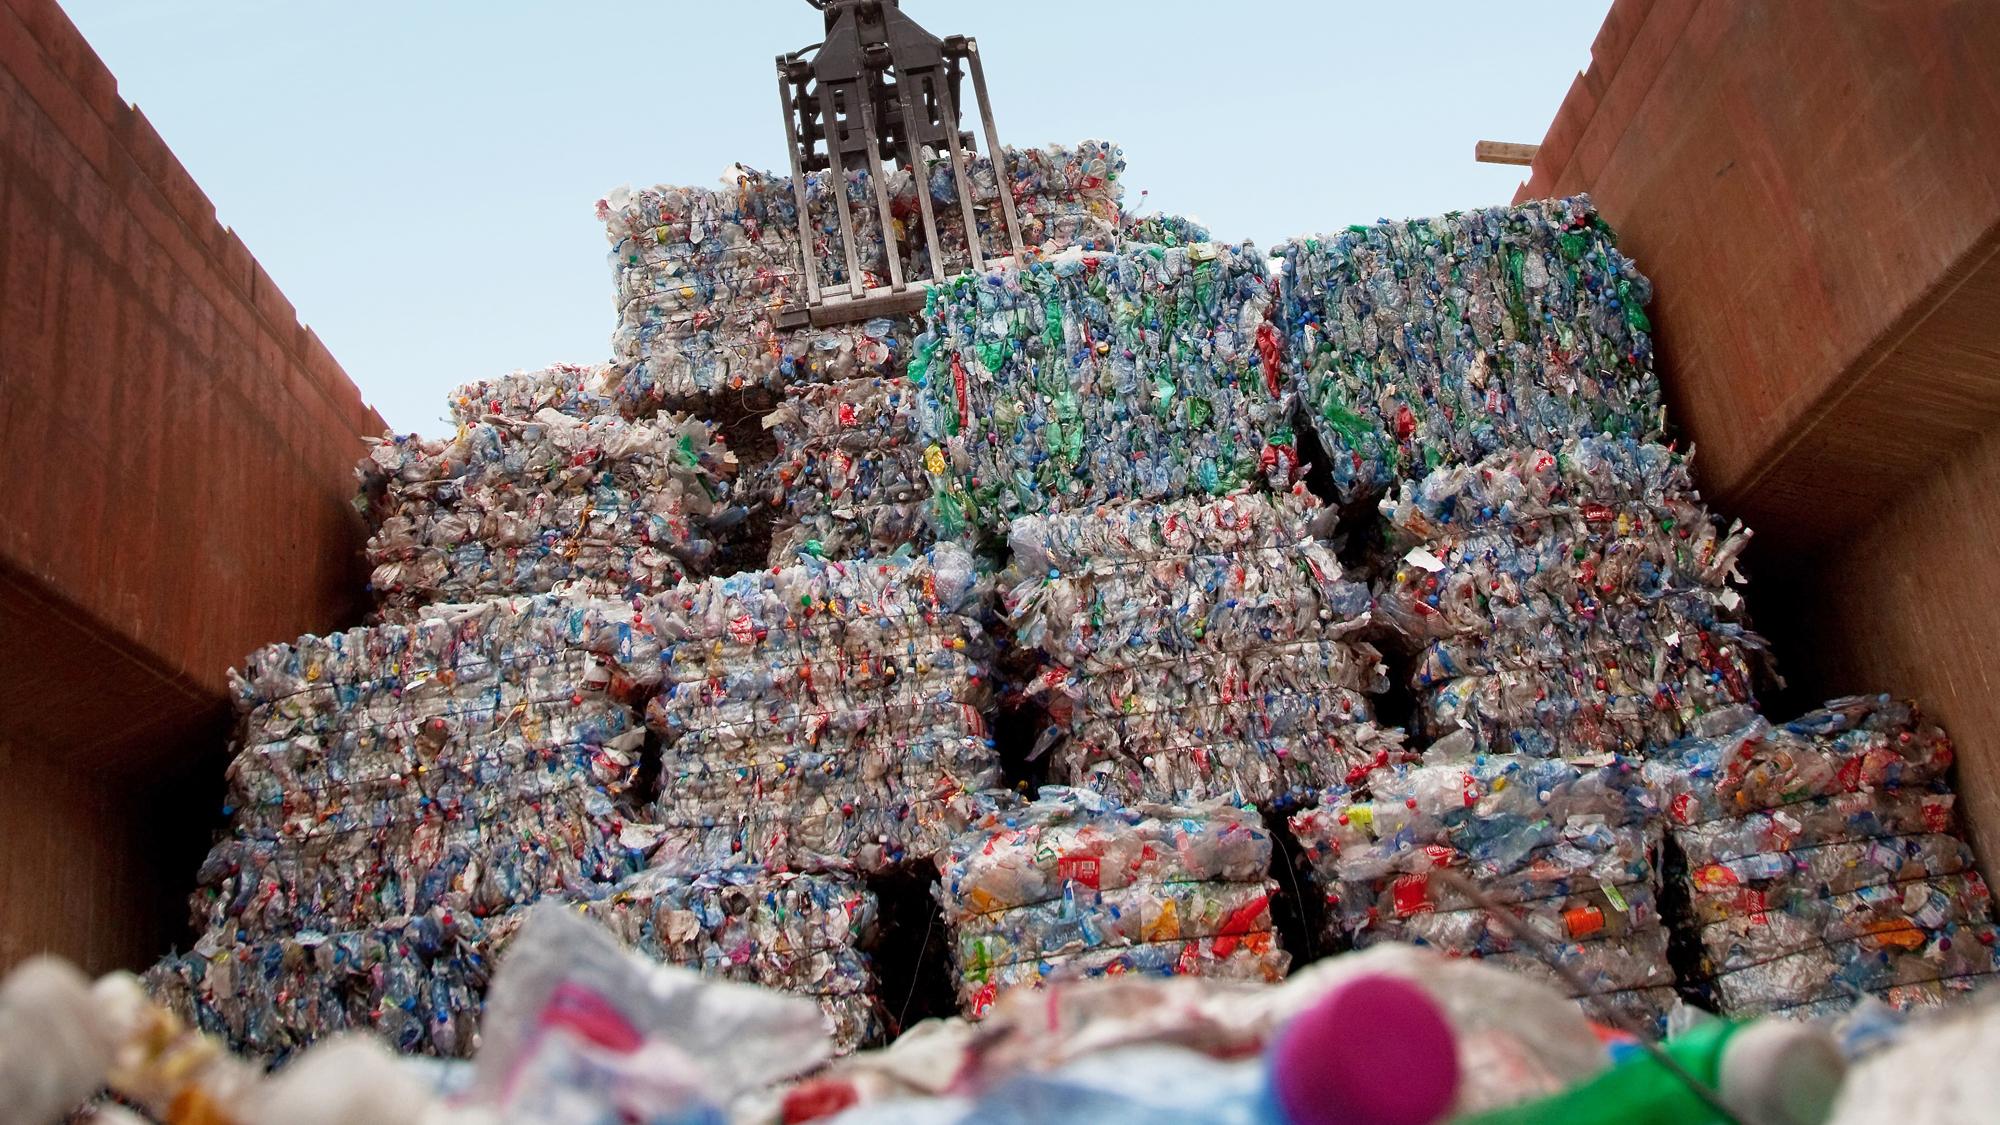 Crane loading plastic bales into container bin.